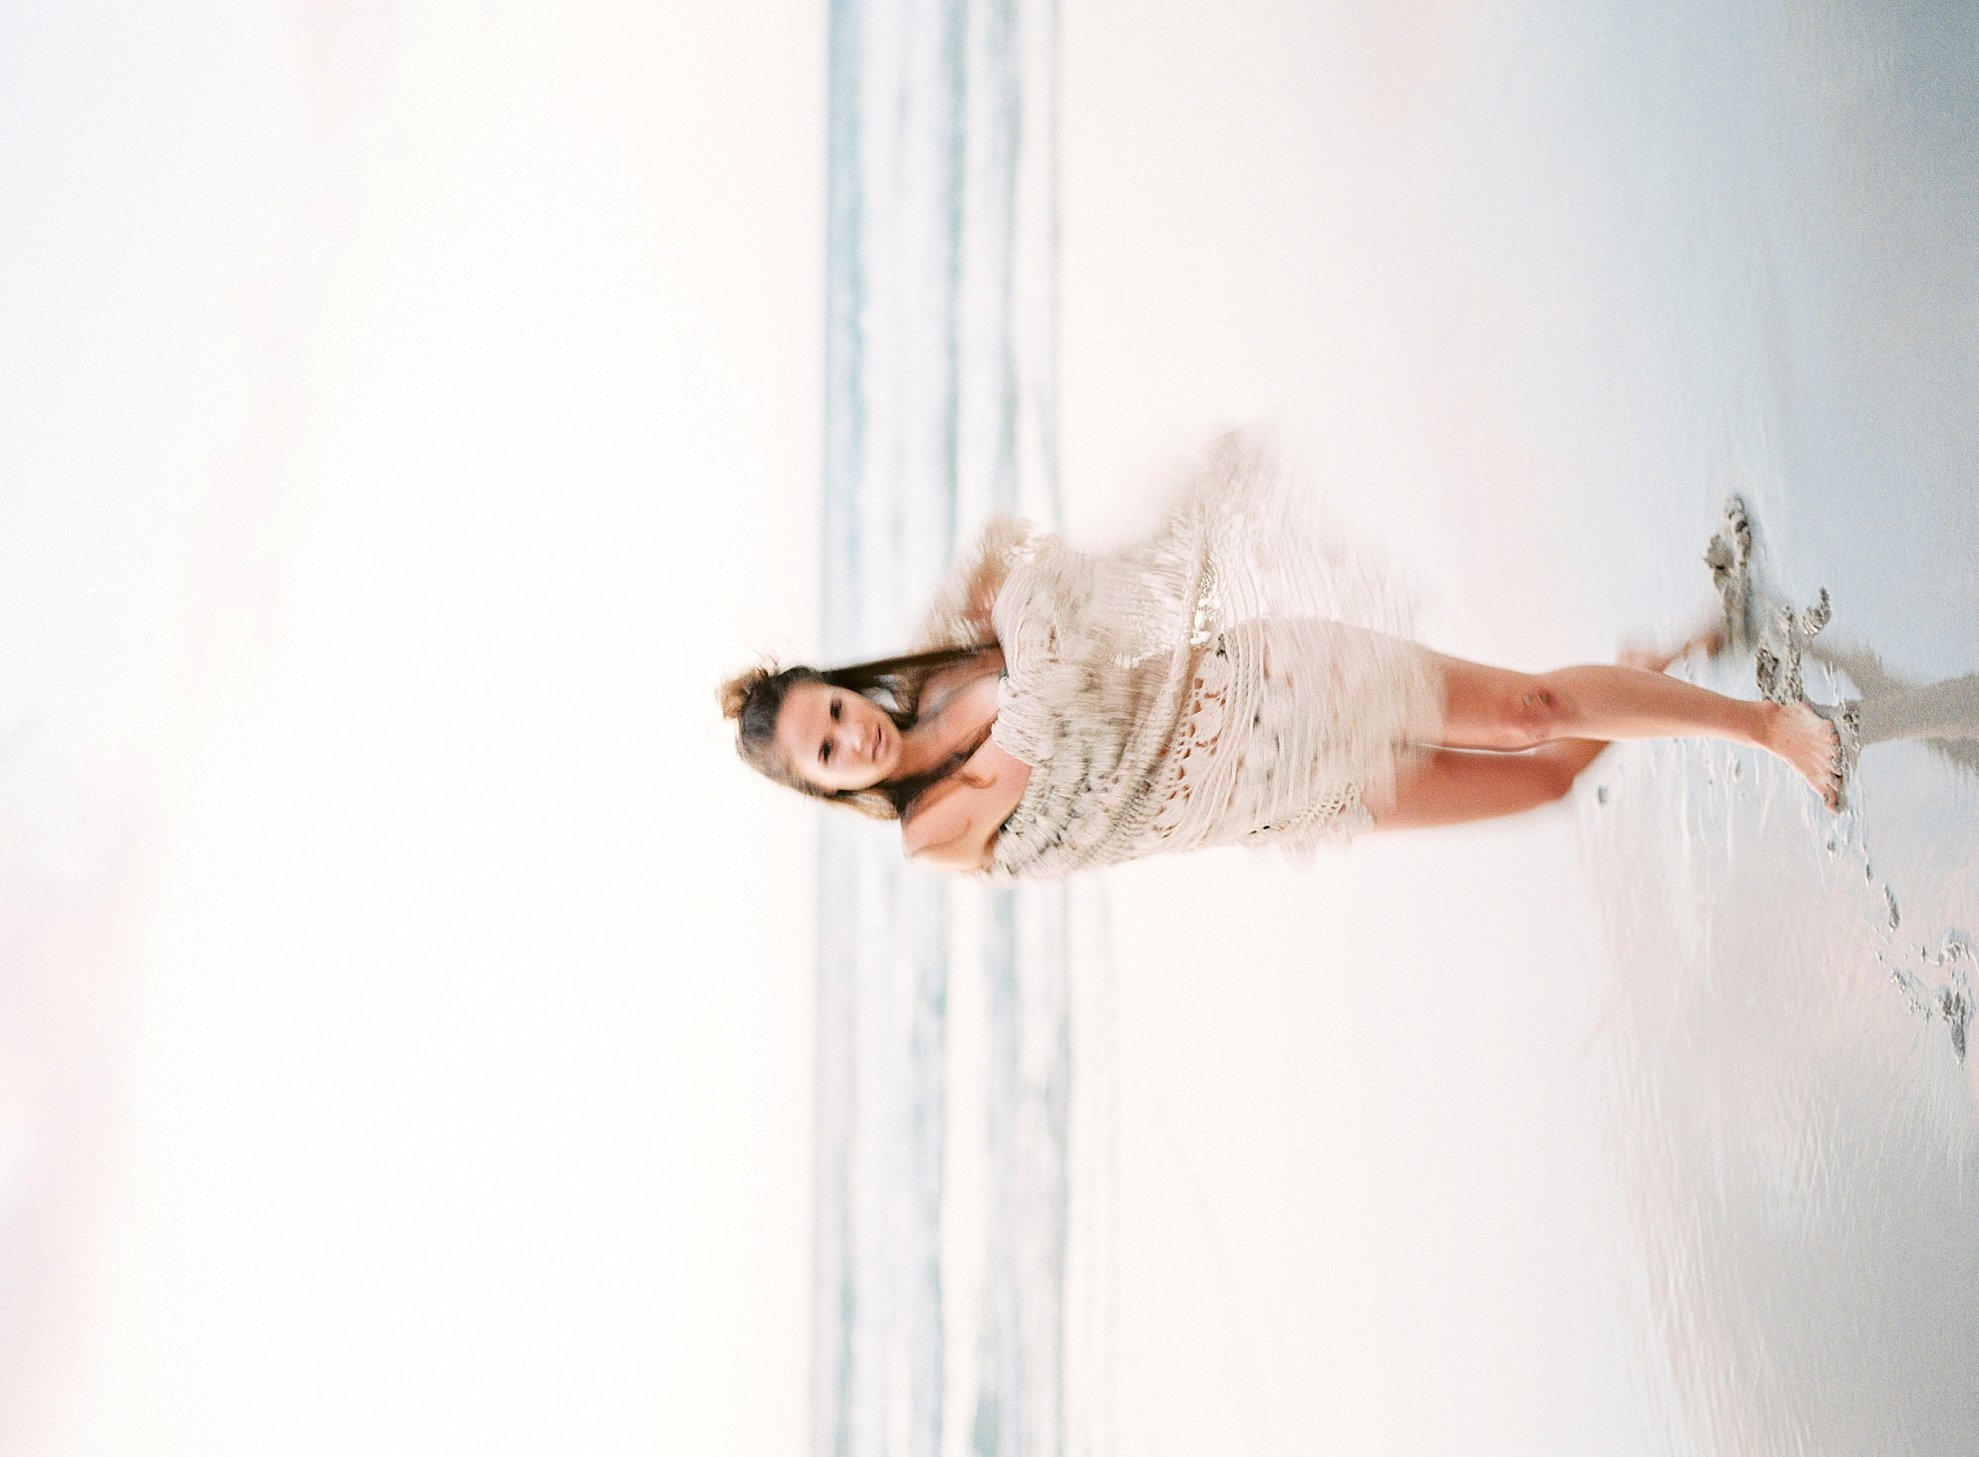 Amanda-Drost-fine-art-film-photography-bridal-editorial-south-africa_0016.jpg